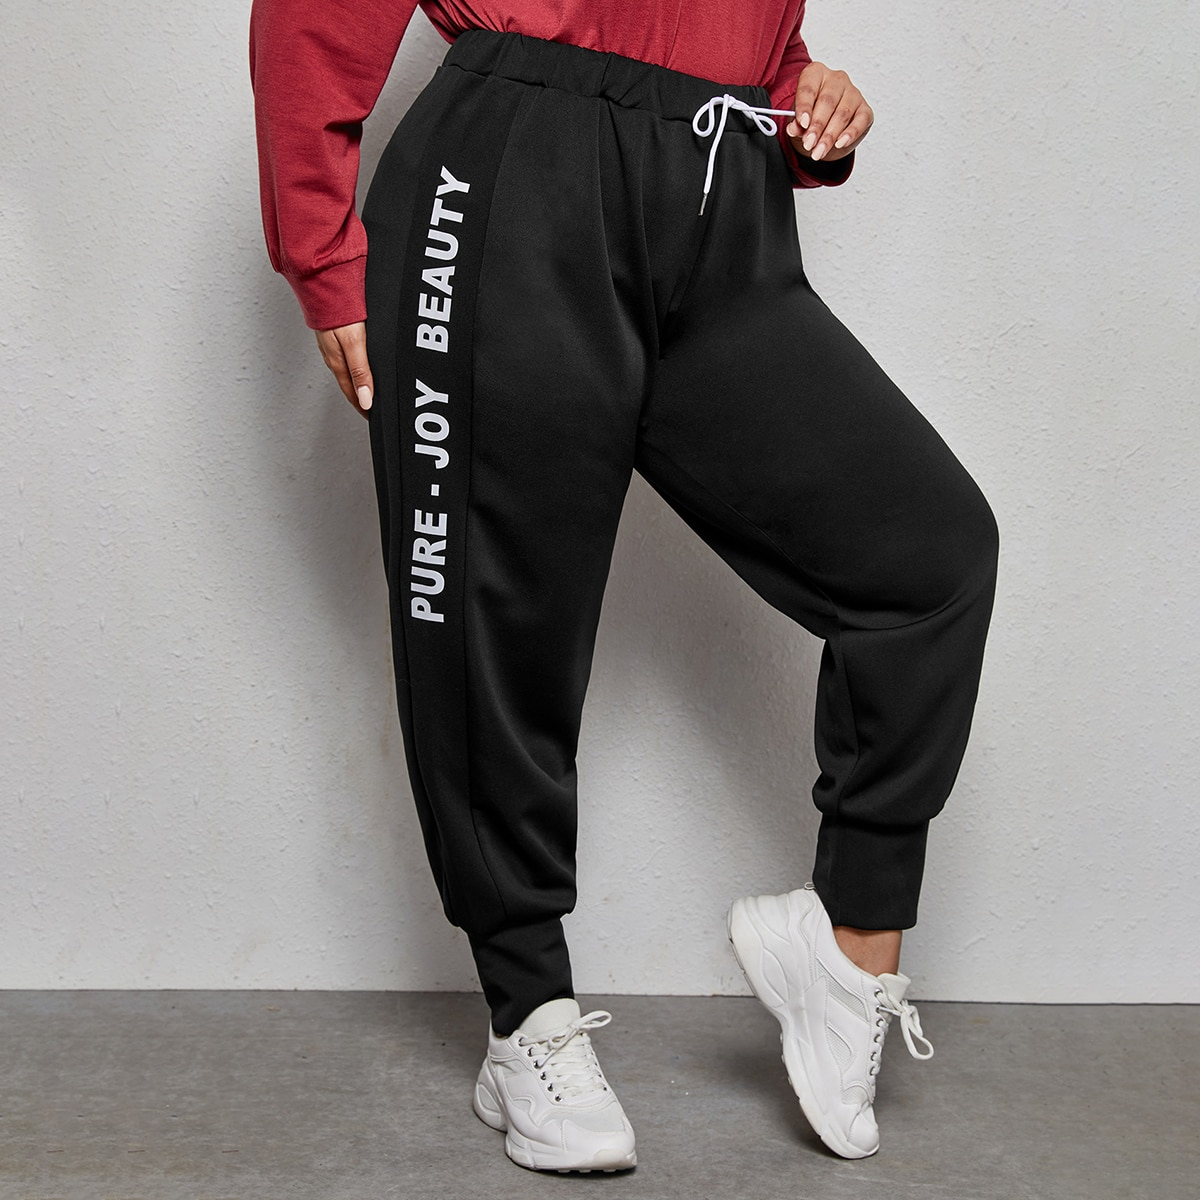 На кулиске буква спортивный брюки размер плюс